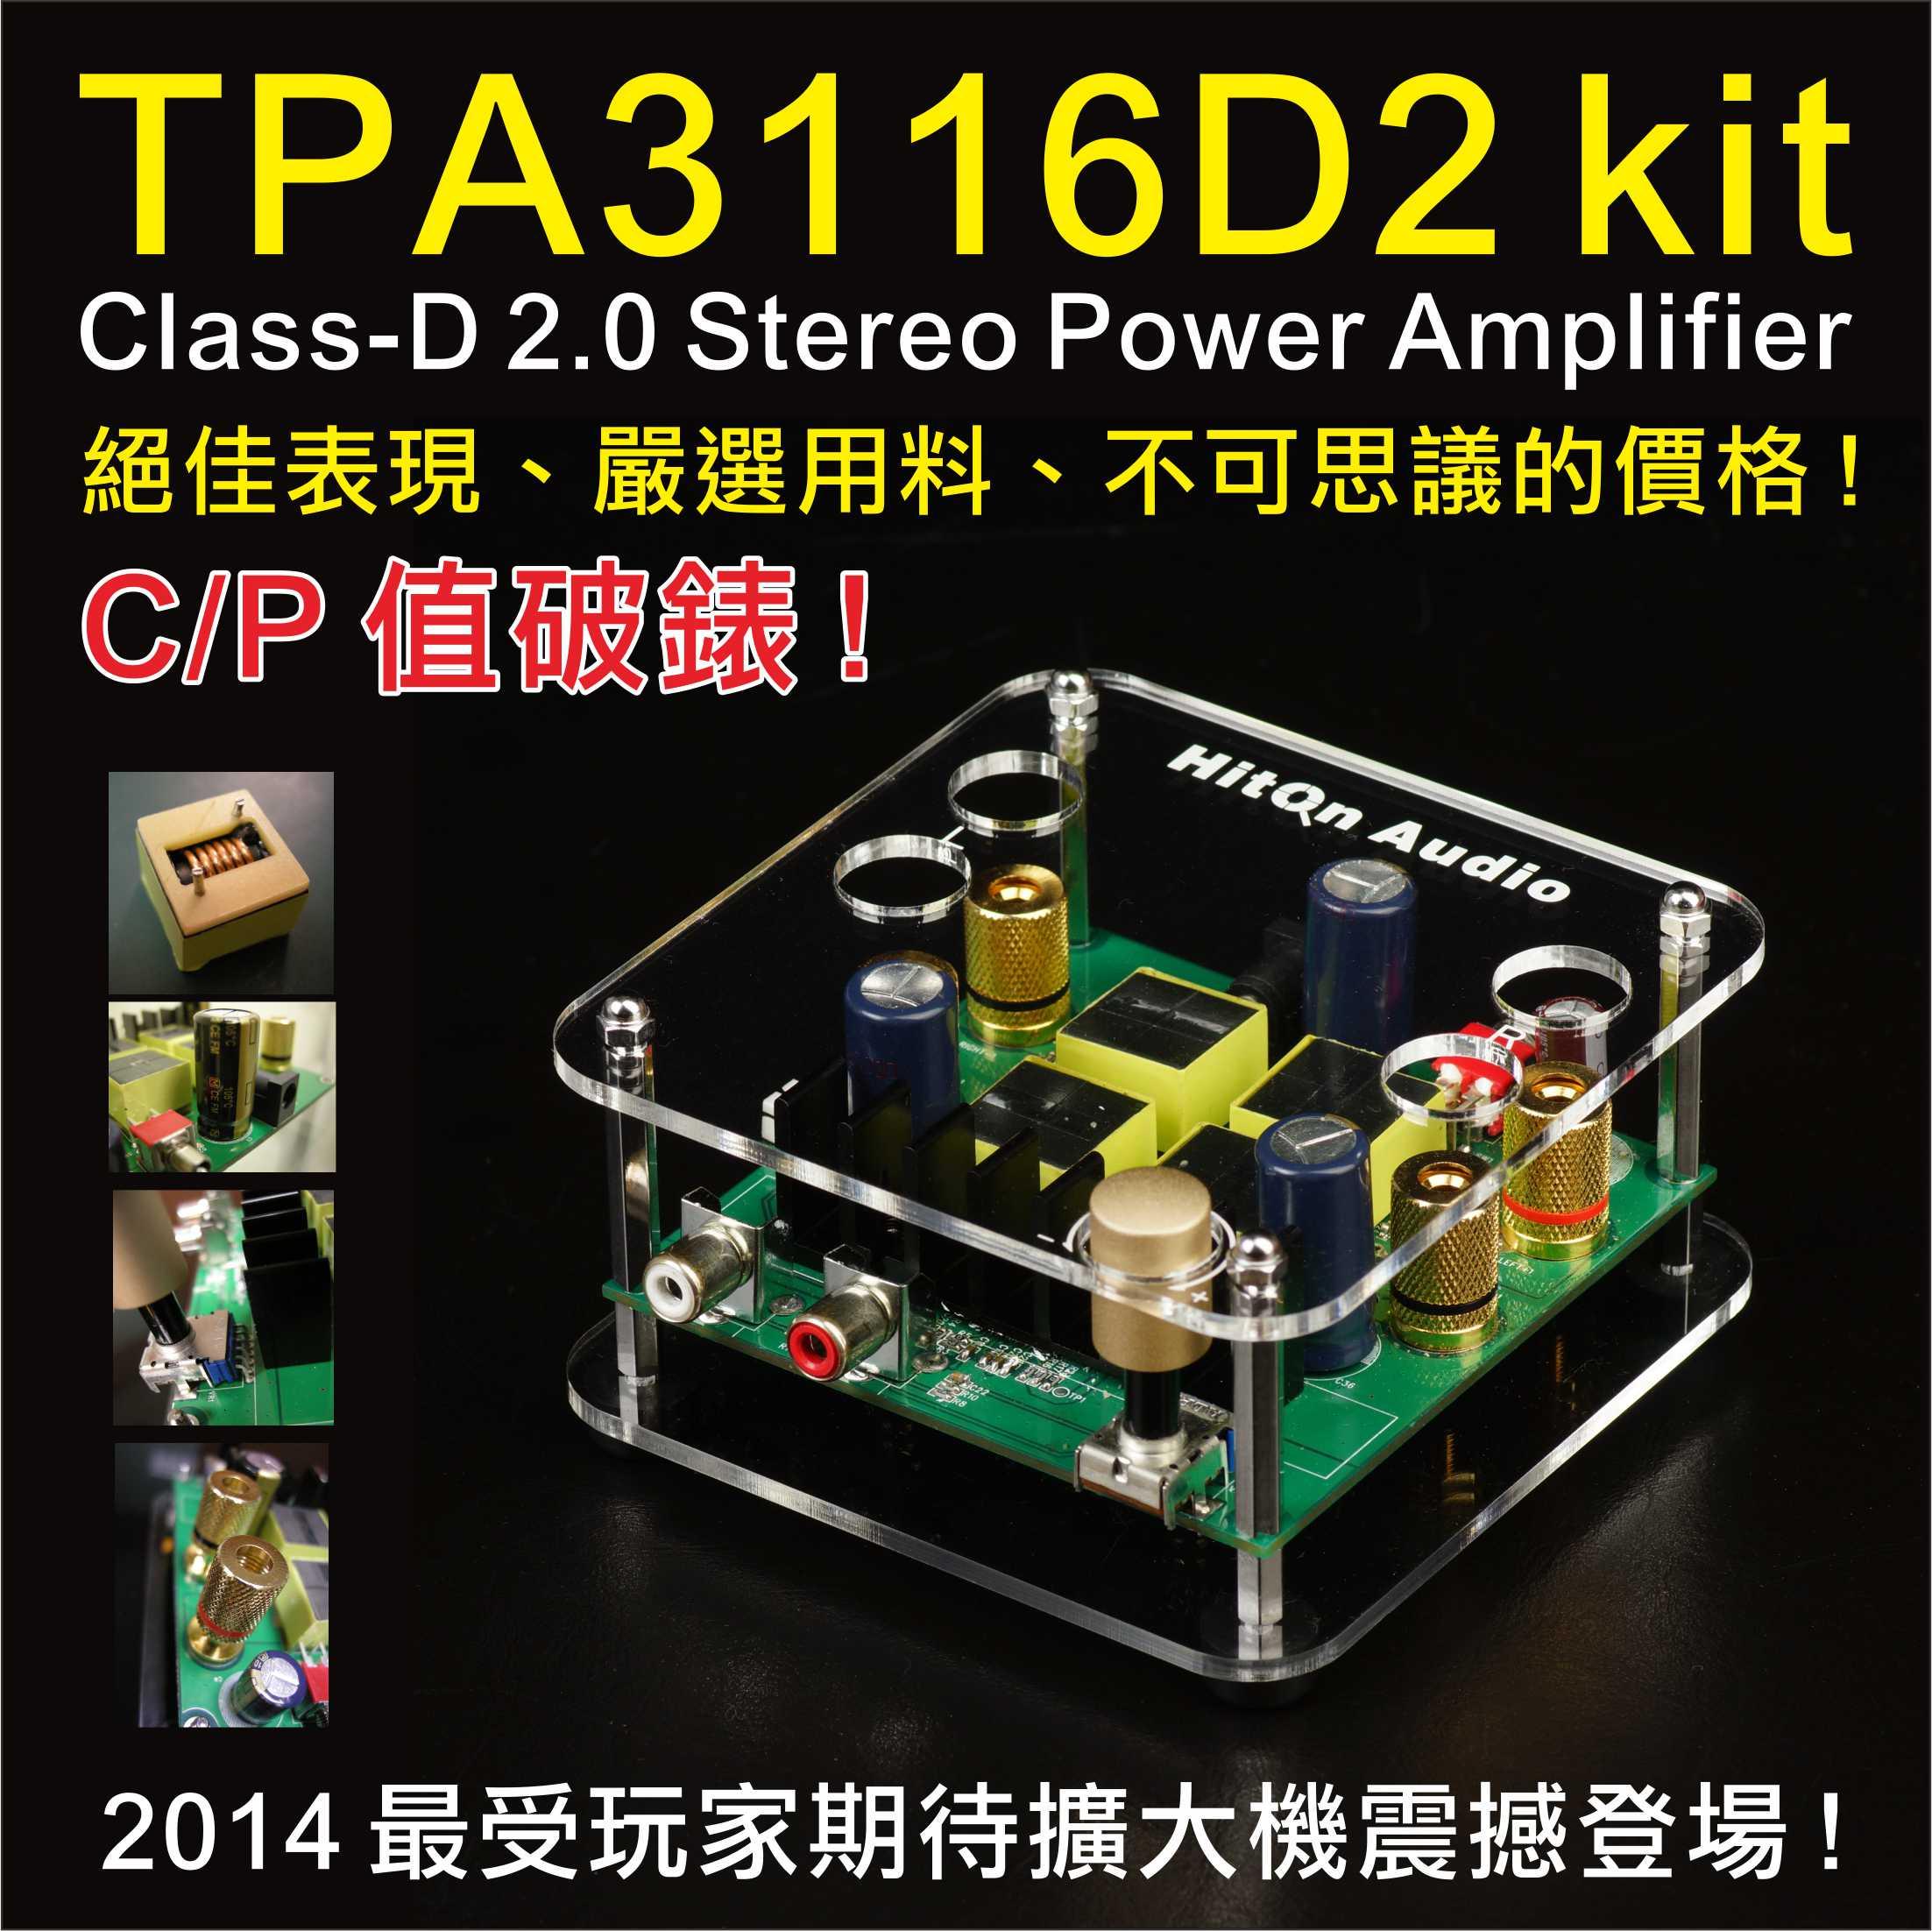 tpa3116d2 kit 扩大机